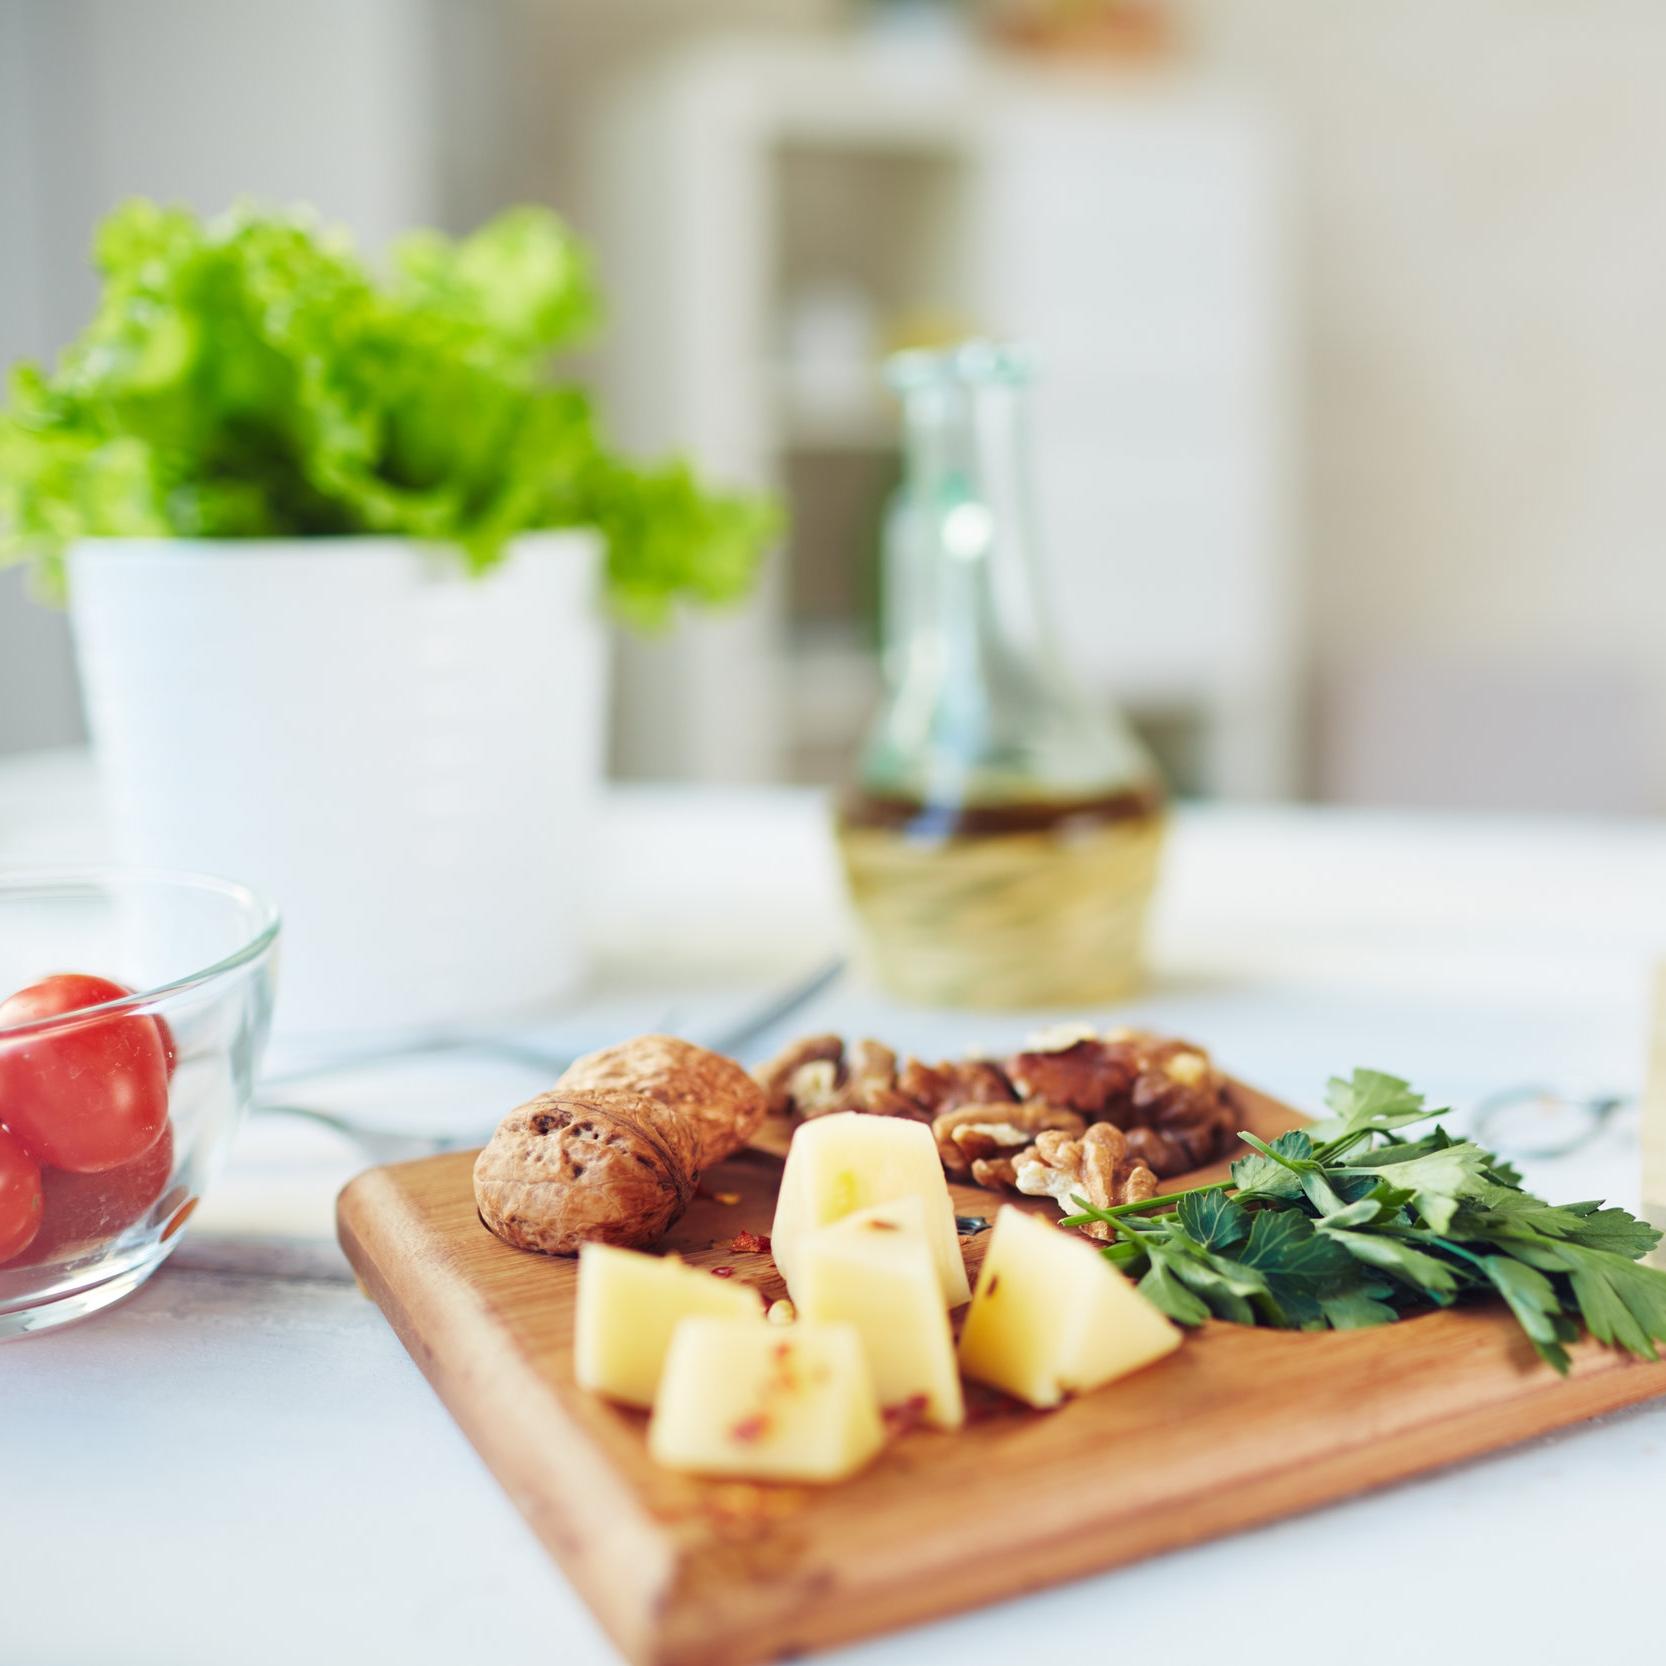 graphicstock-healthy-food-on-dinner-table_BXbAkCSGEW.jpg